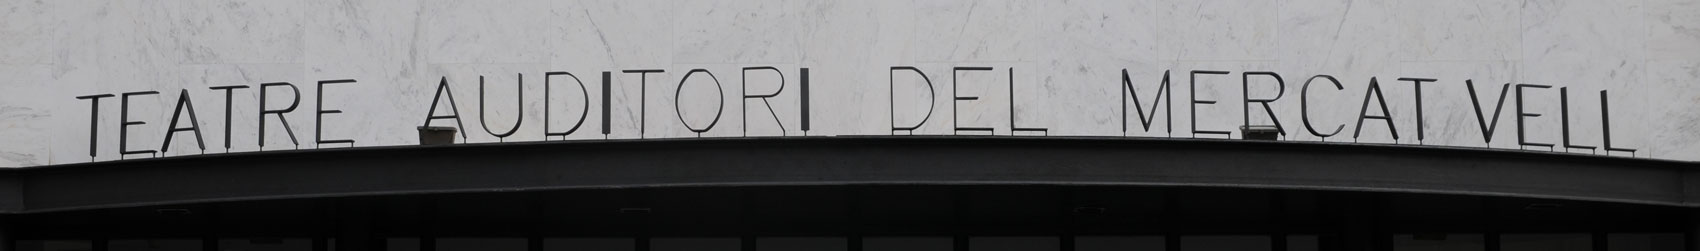 Teatre Auditori del Mercat Vell, Ripollet